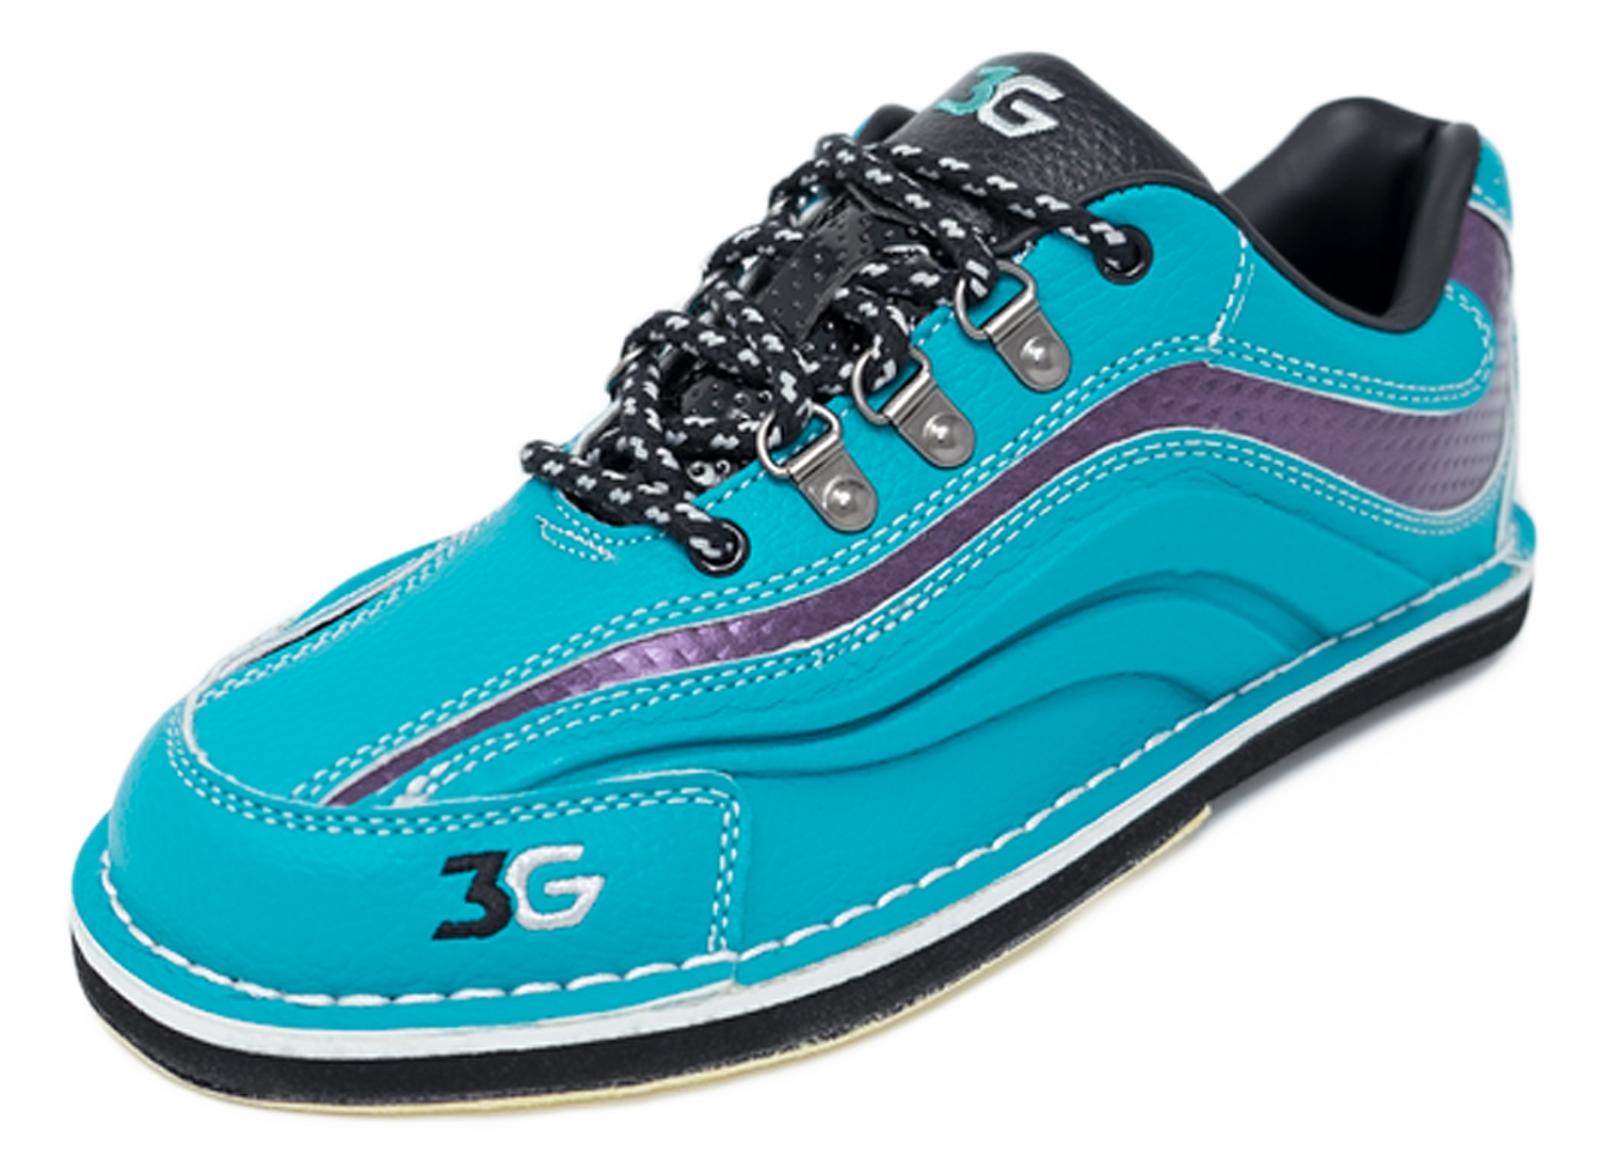 3G Sport Ultra Womens Teal//Purple Interchangeable Bowling Shoes